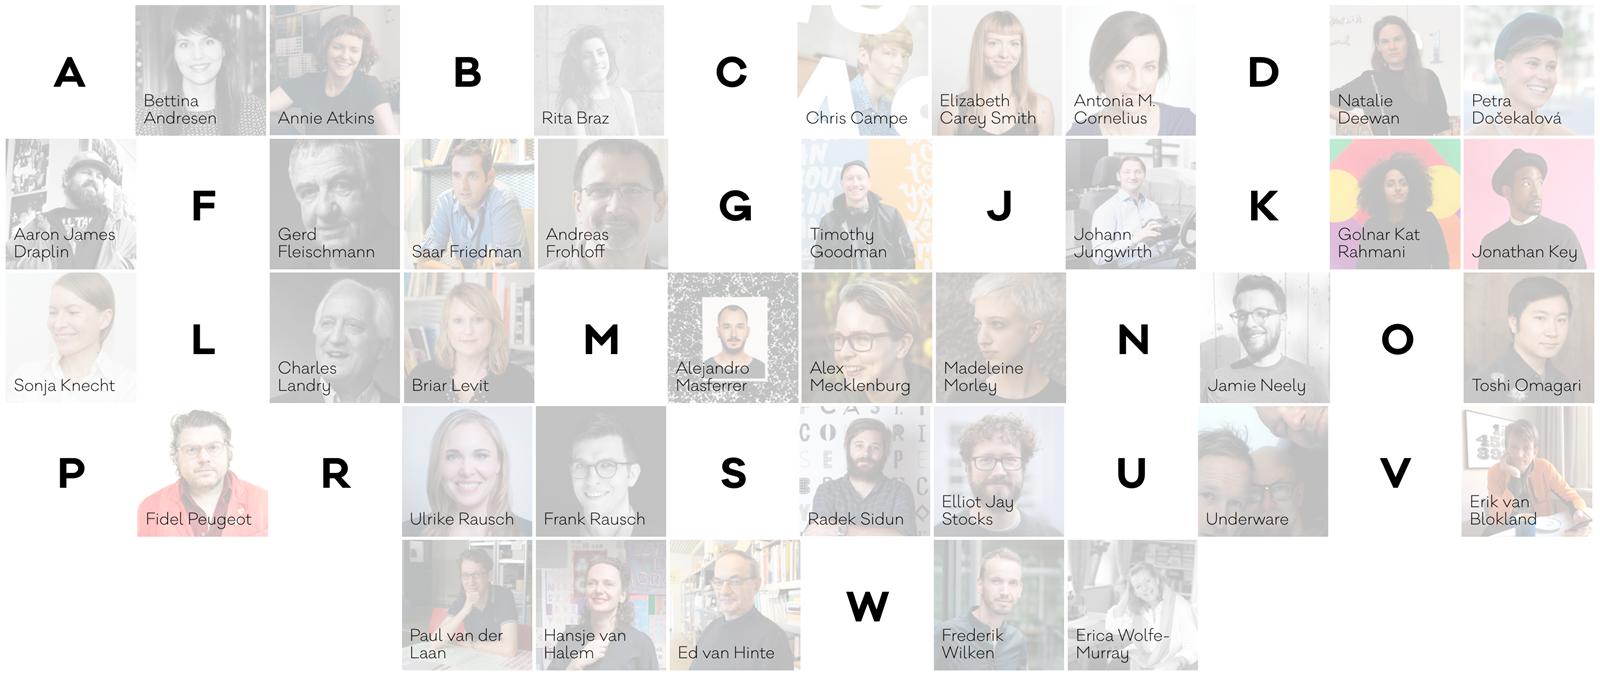 TYPO Berlin 2018 speaker roster